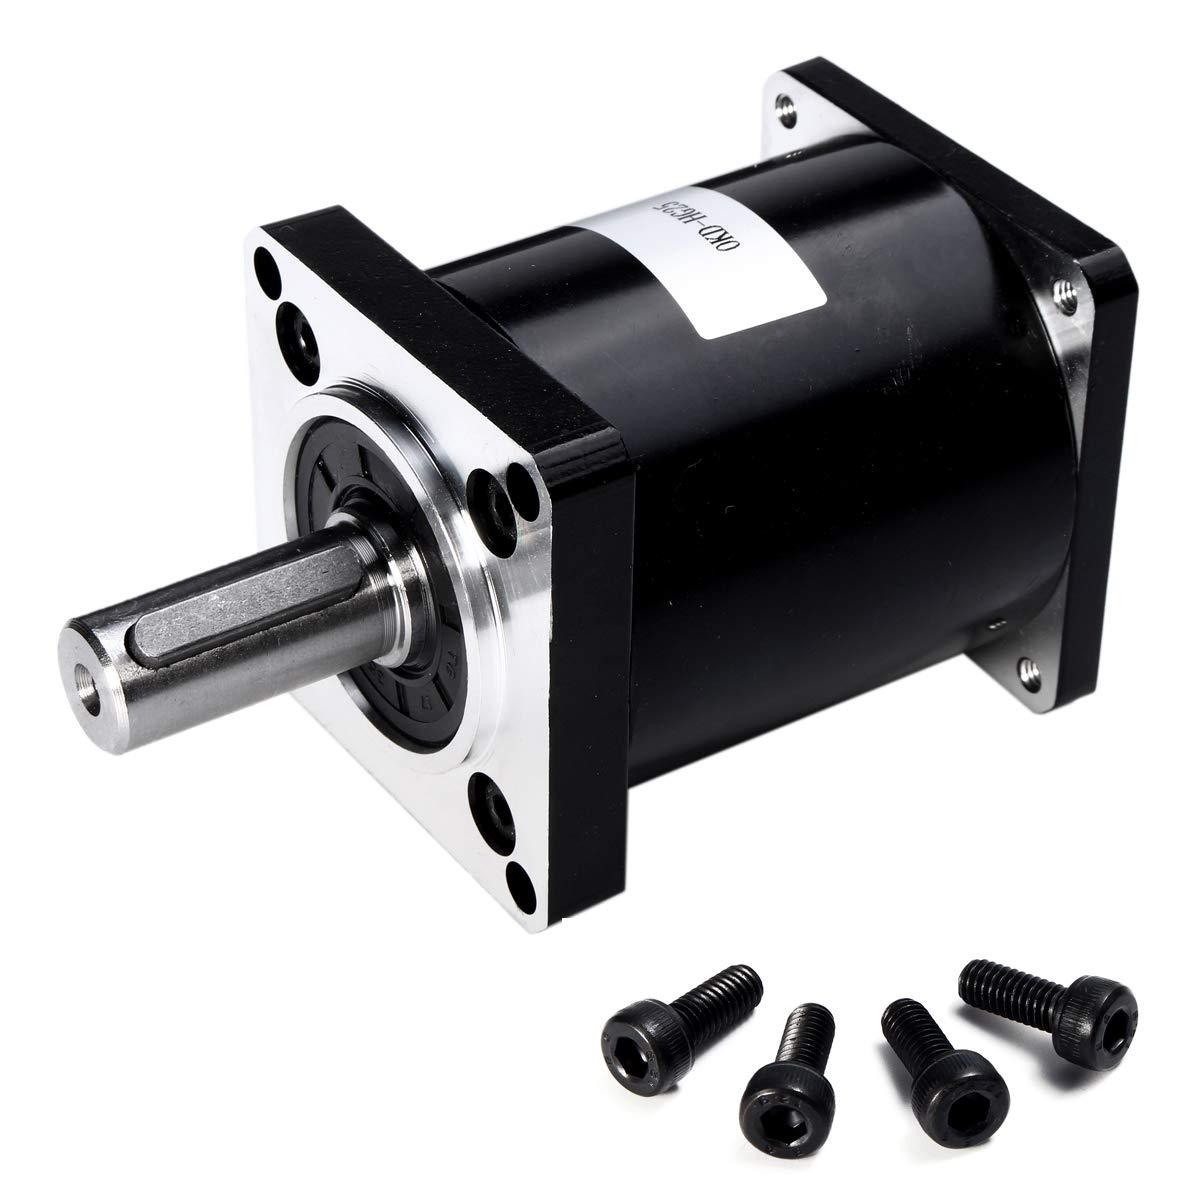 CoCocina 57mm Nema 23 Planetary Reduction Gear Motor Ratio 4:1 5:1 10:1 15:1 20:1 25:1 30:1 40:1 50:1 100:1-4:1